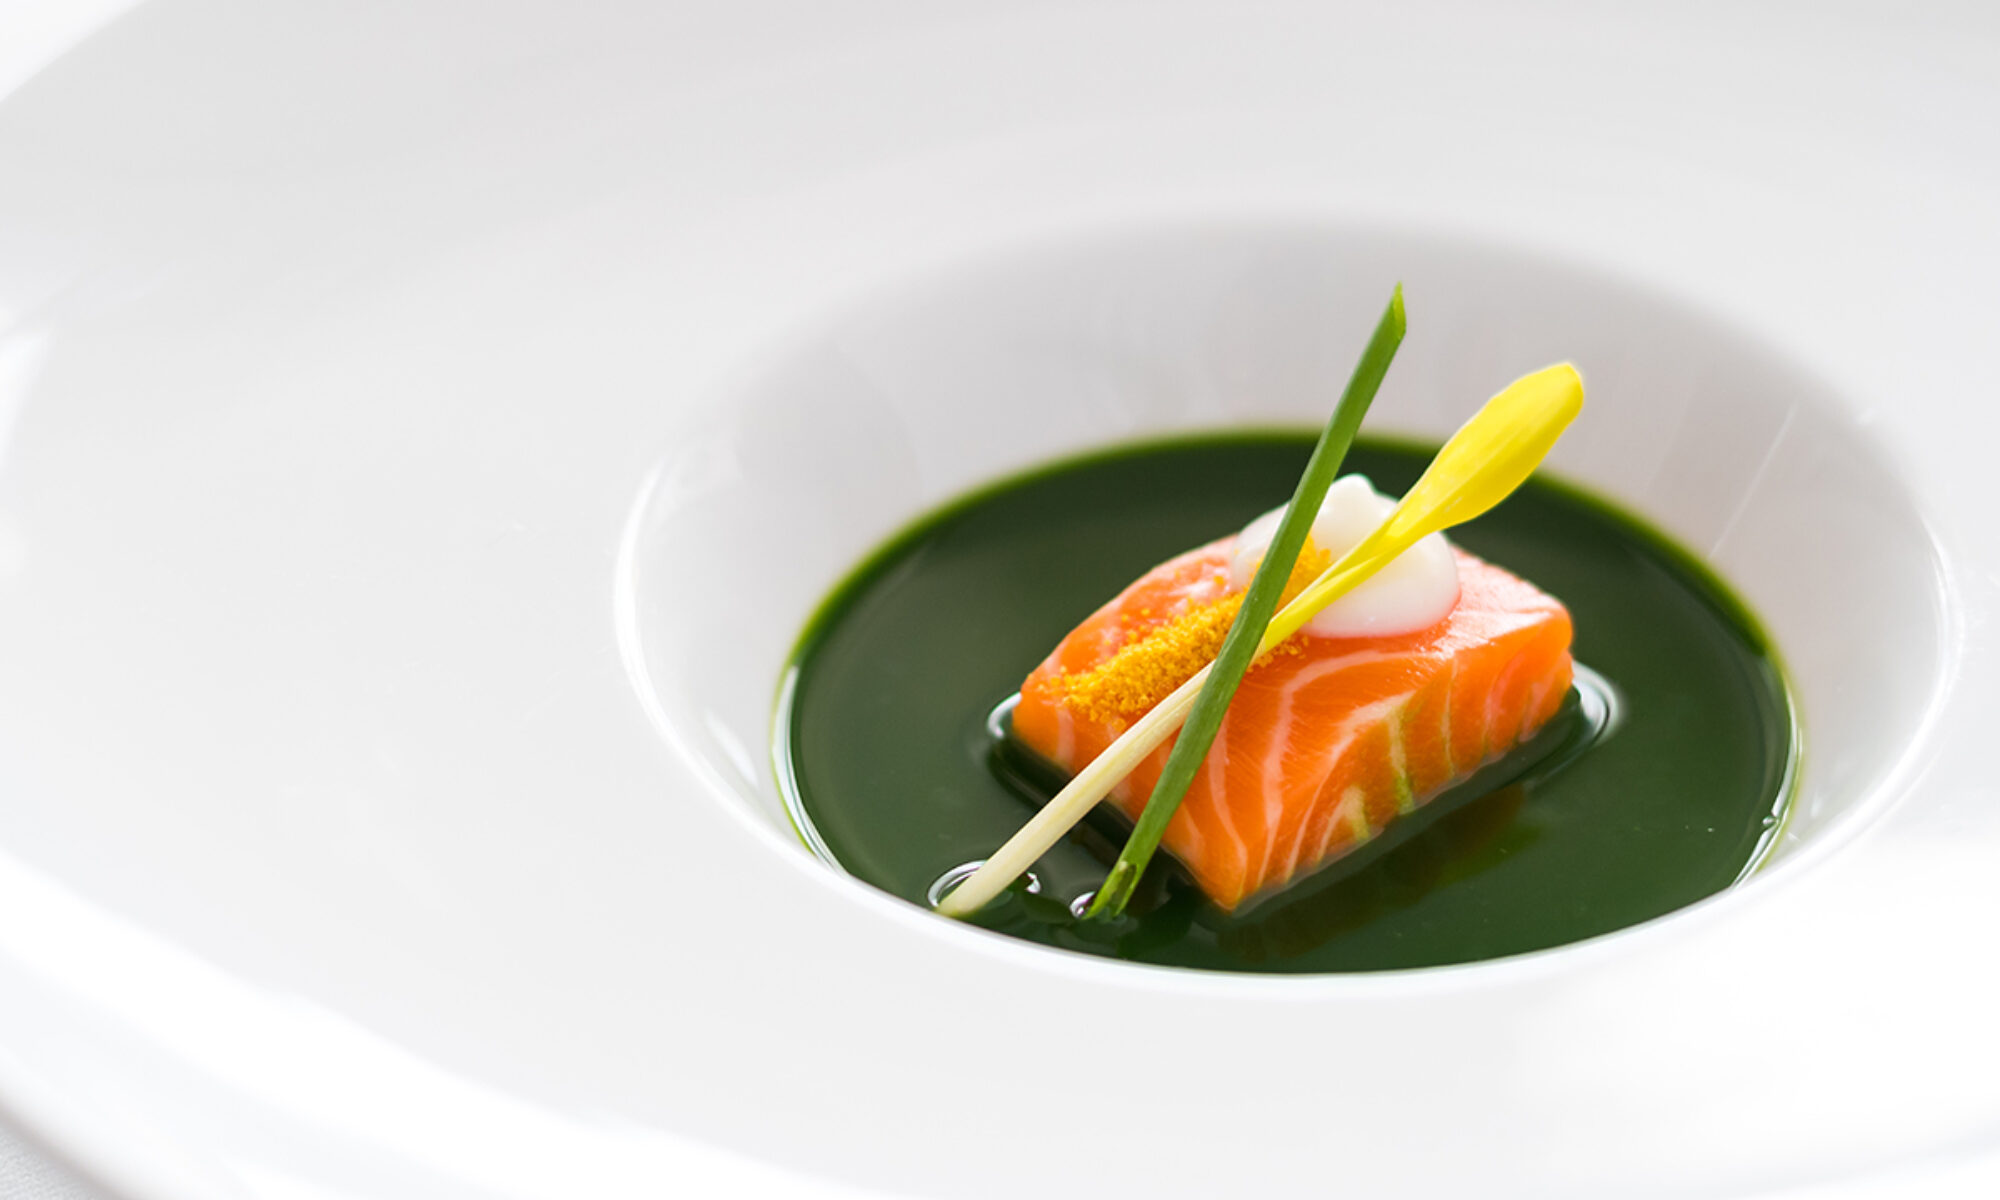 Exquisite food. Impeccable service.